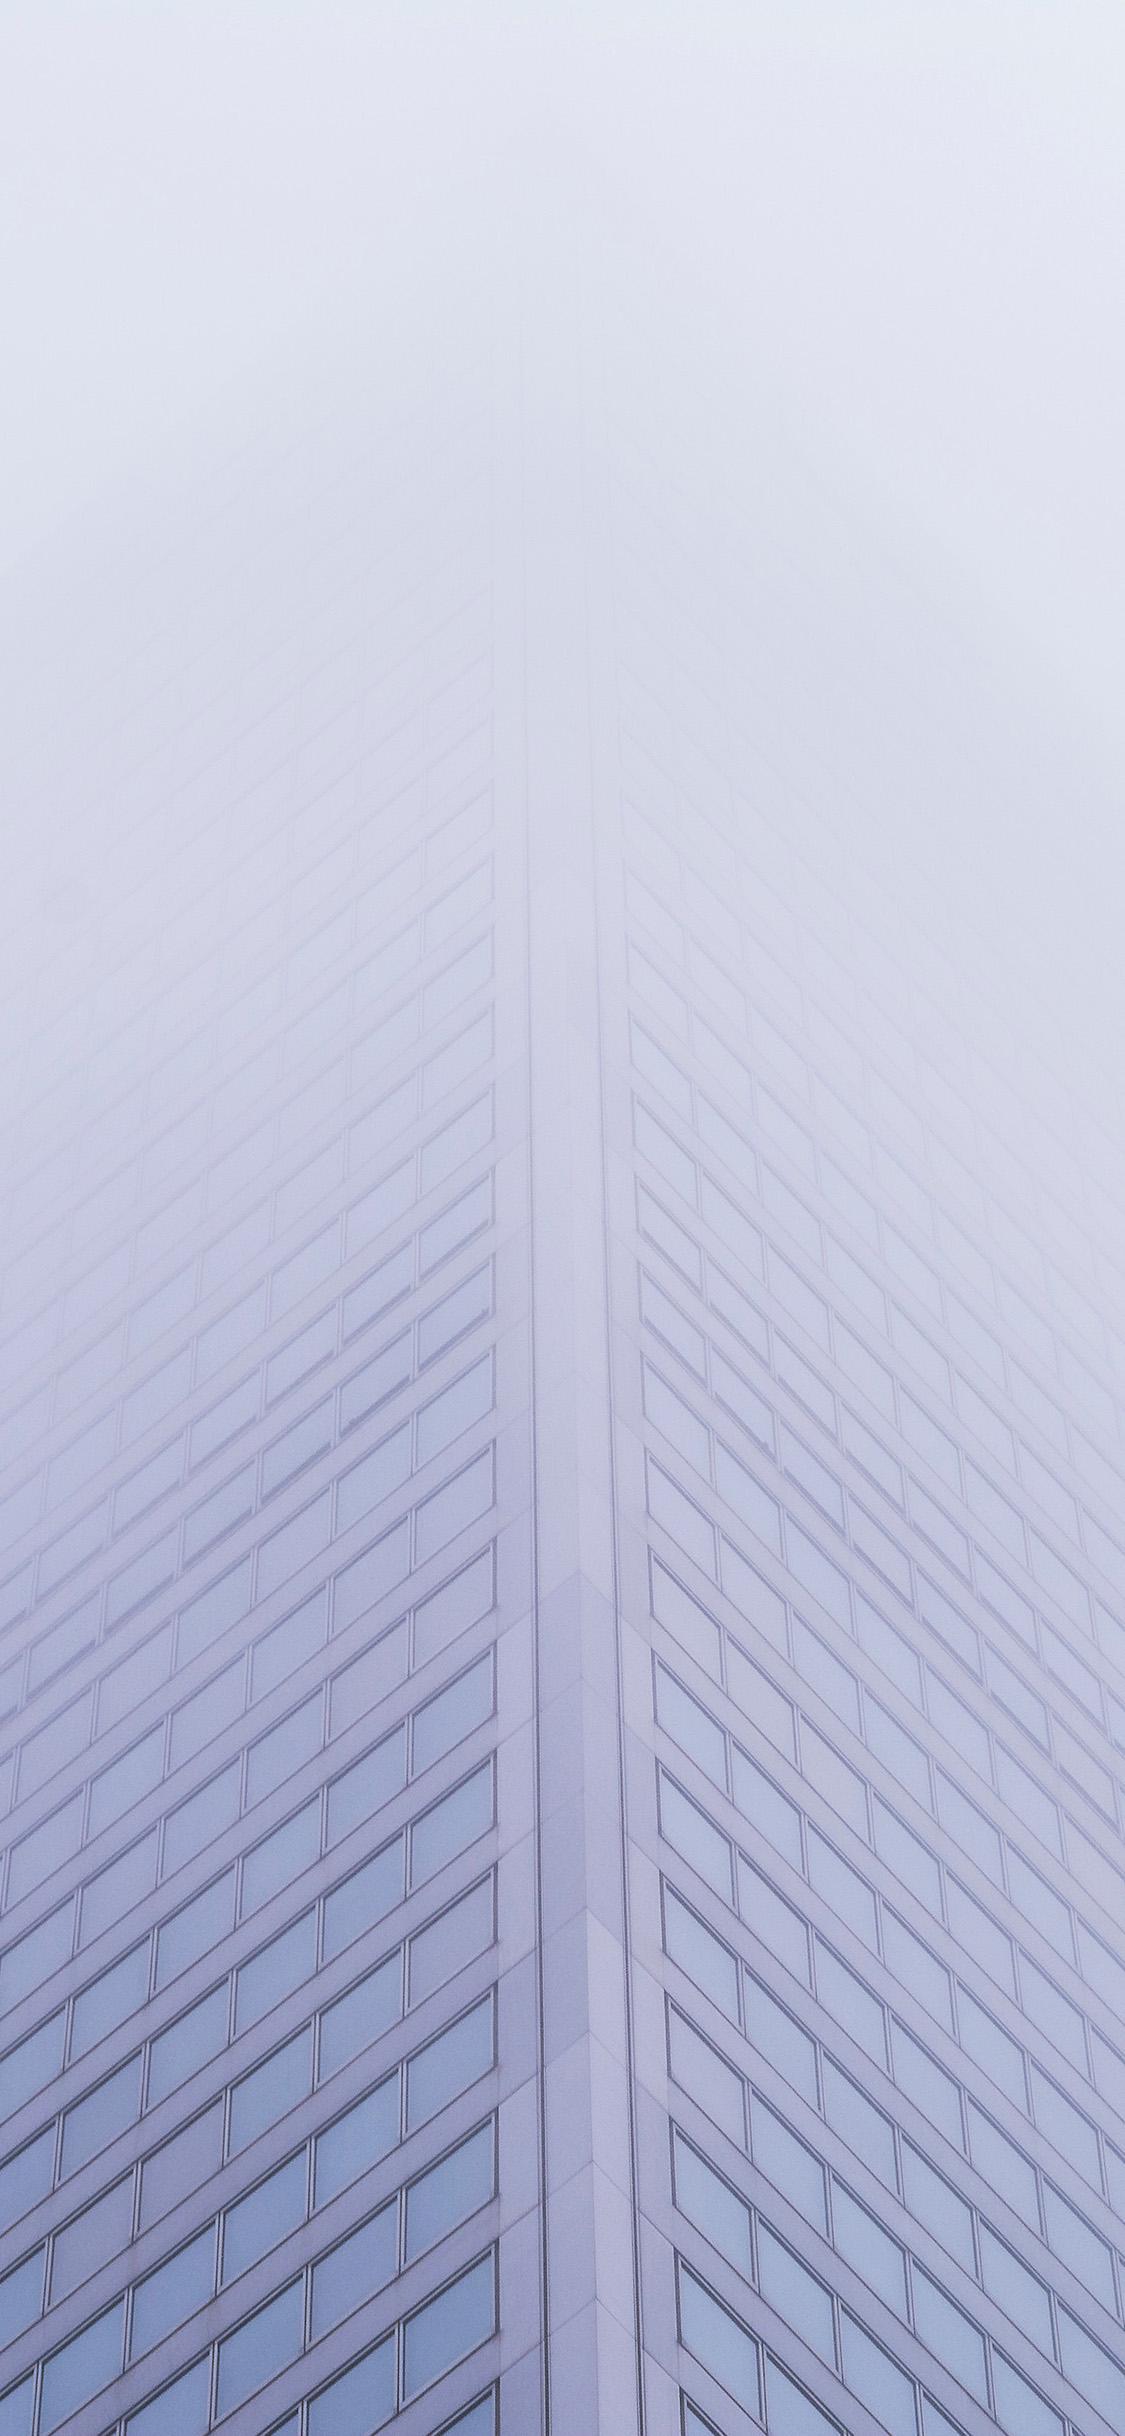 iPhonexpapers.com-Apple-iPhone-wallpaper-od31-nature-fog-city-building-architecture